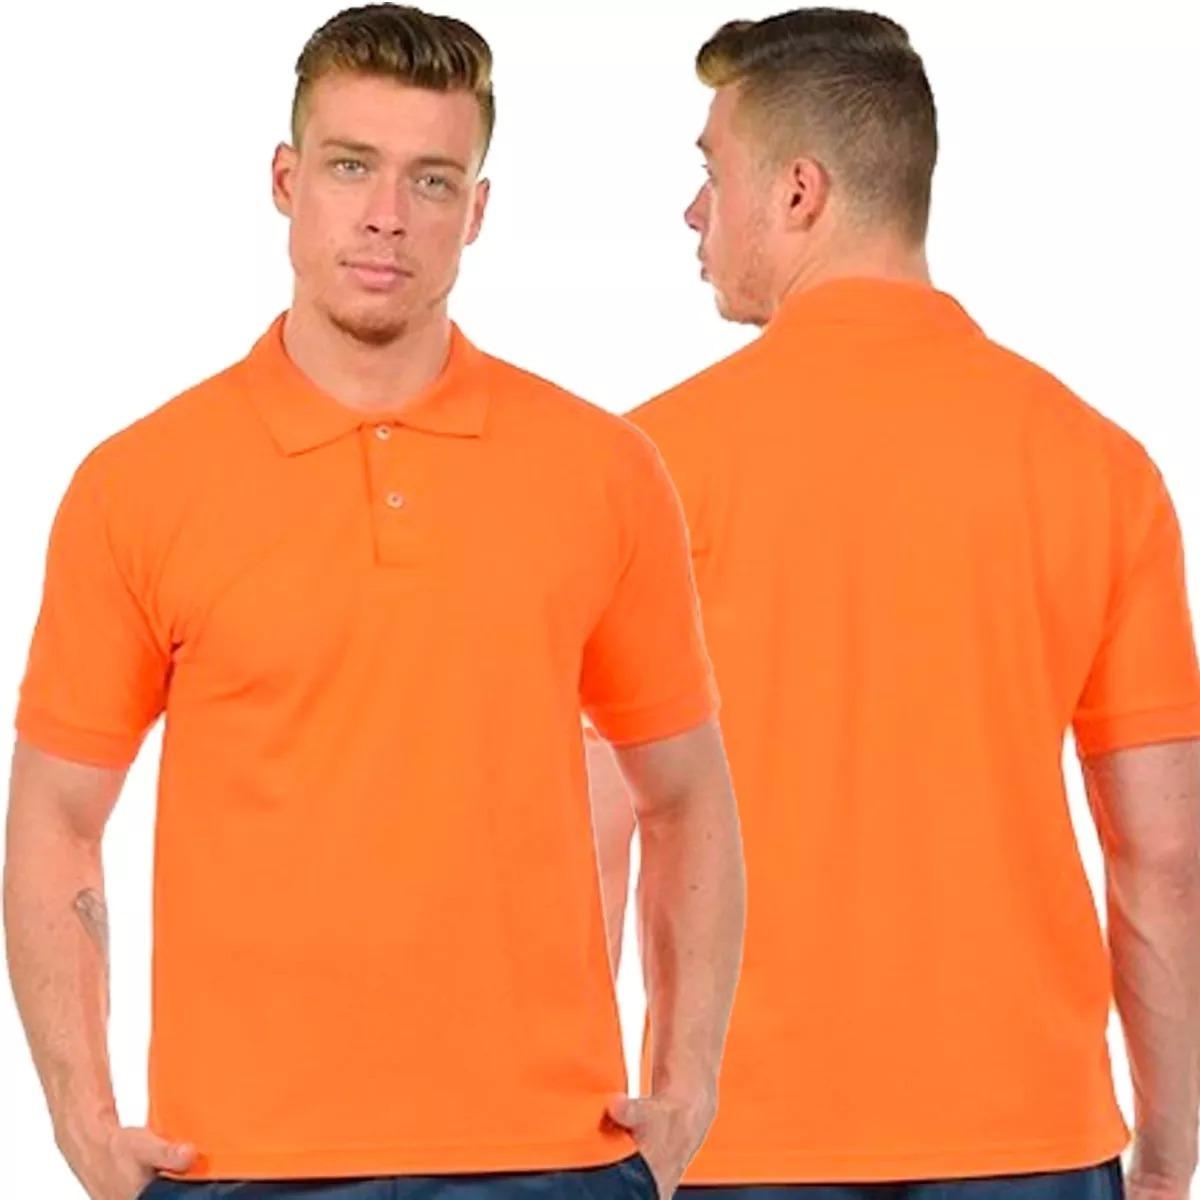 3587719c748b2 Kit 10 Camisas Polo Masculina Camisetas Gola Uniforme Lisa - R  275 ...